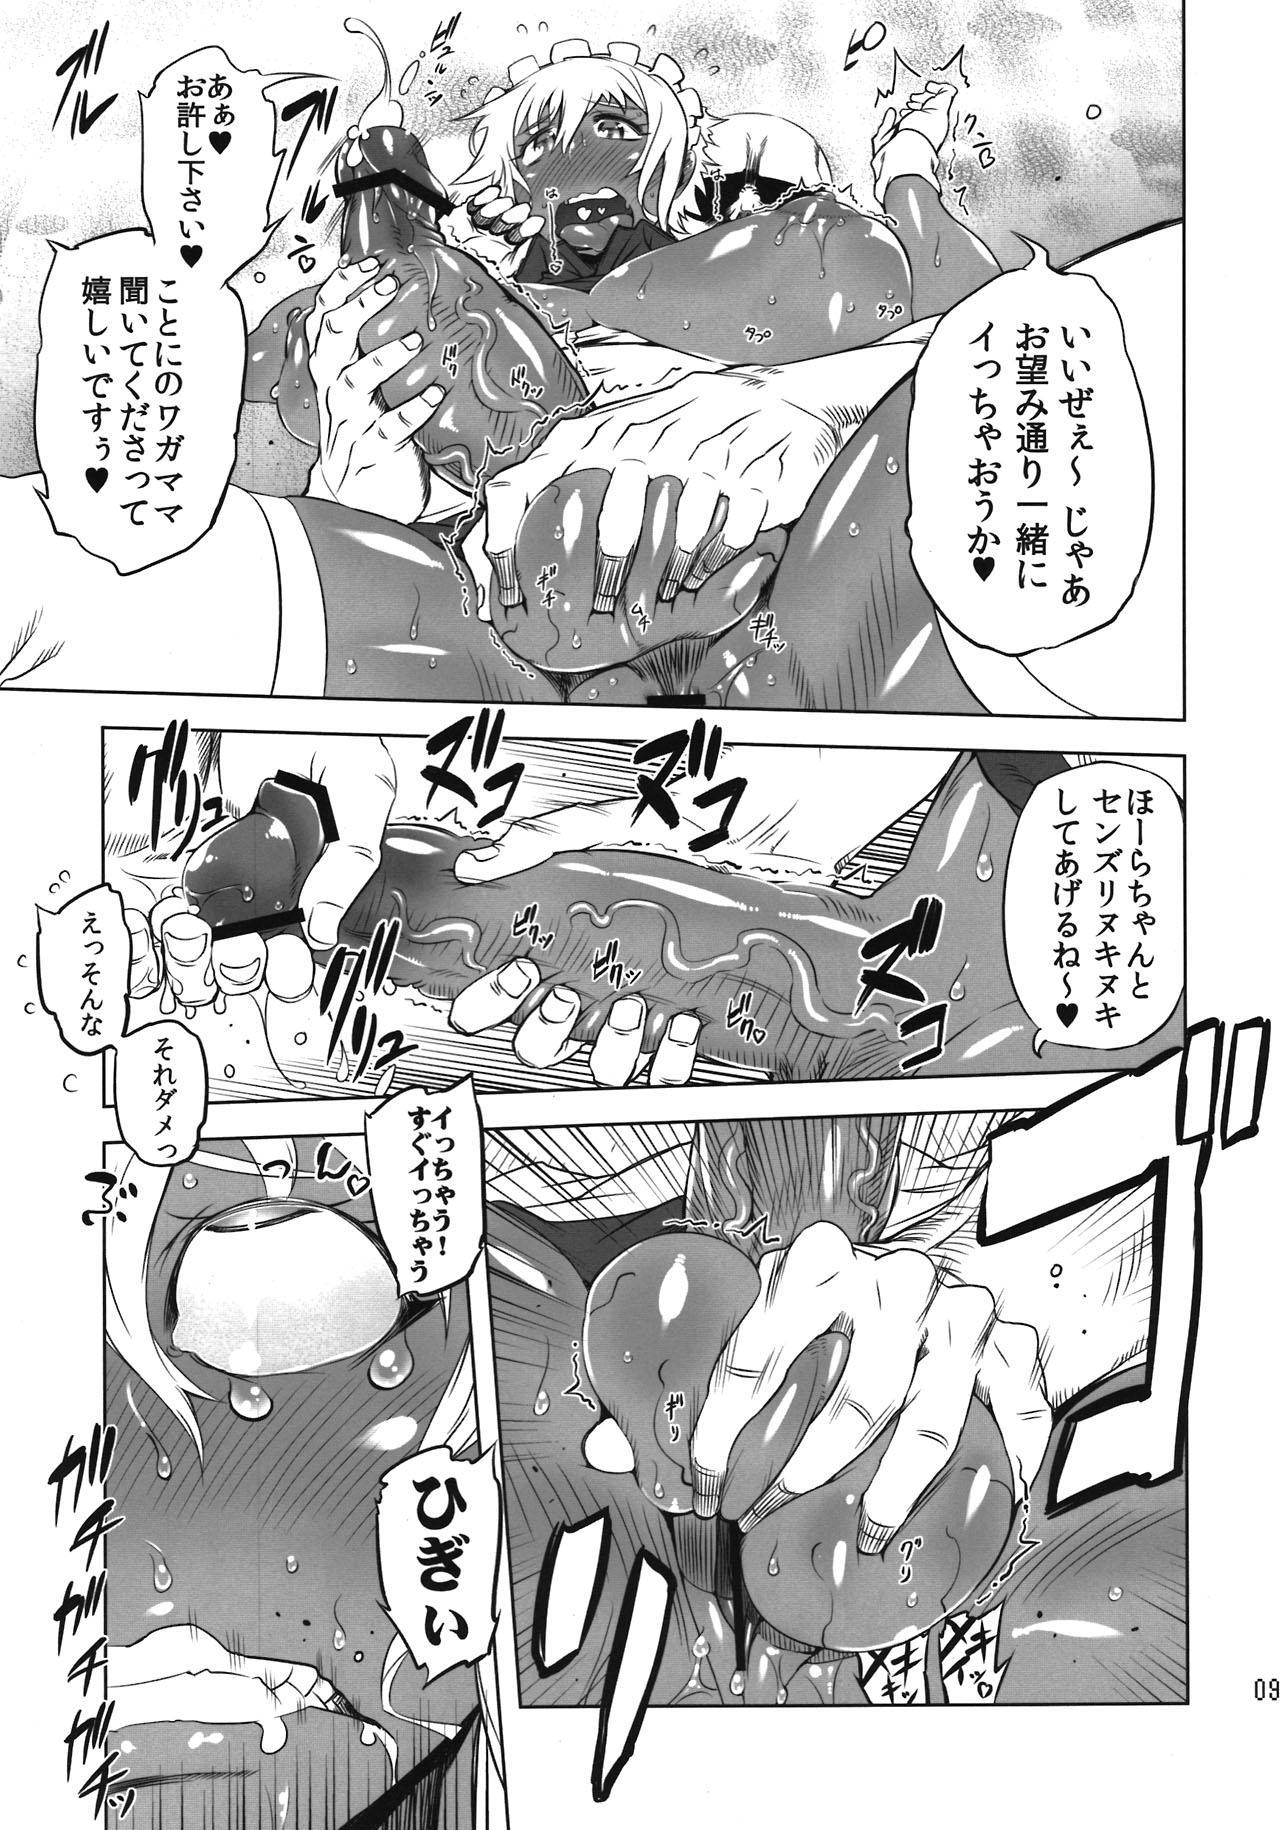 Kotoni-san wo ** Shitai! 8